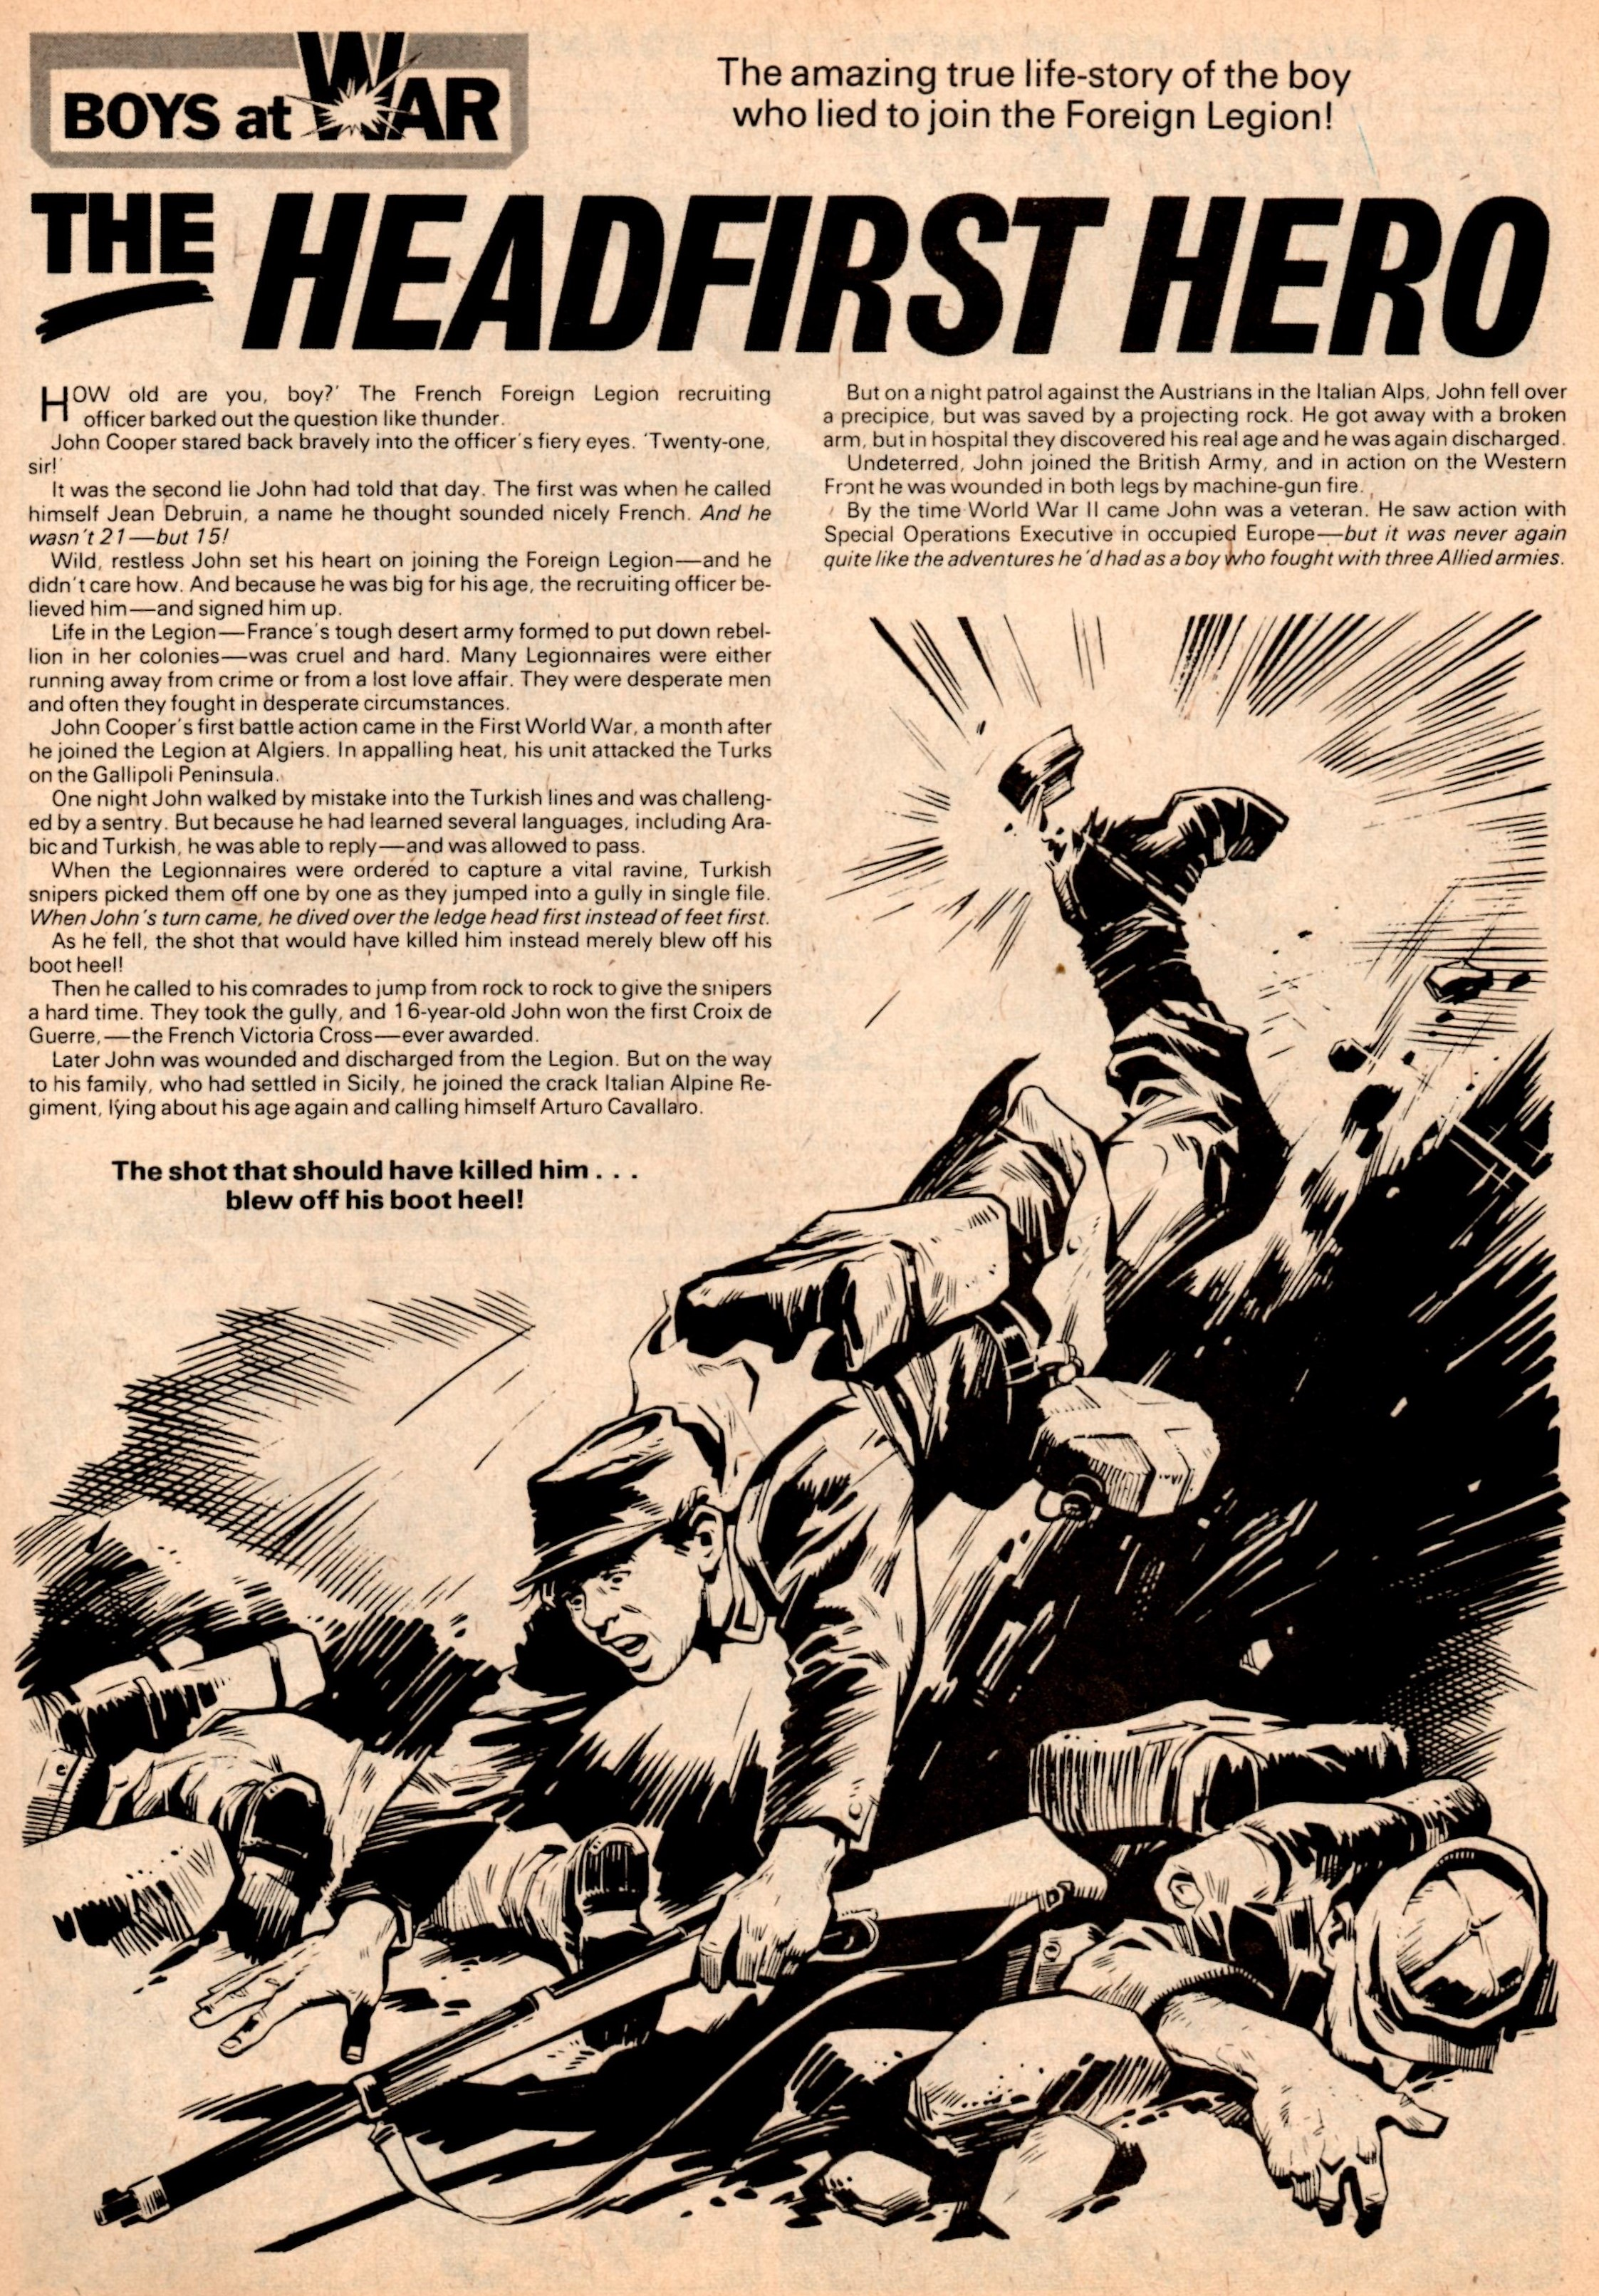 The Headfirst Hero: W Harrington (writer), Mike Western (artist)